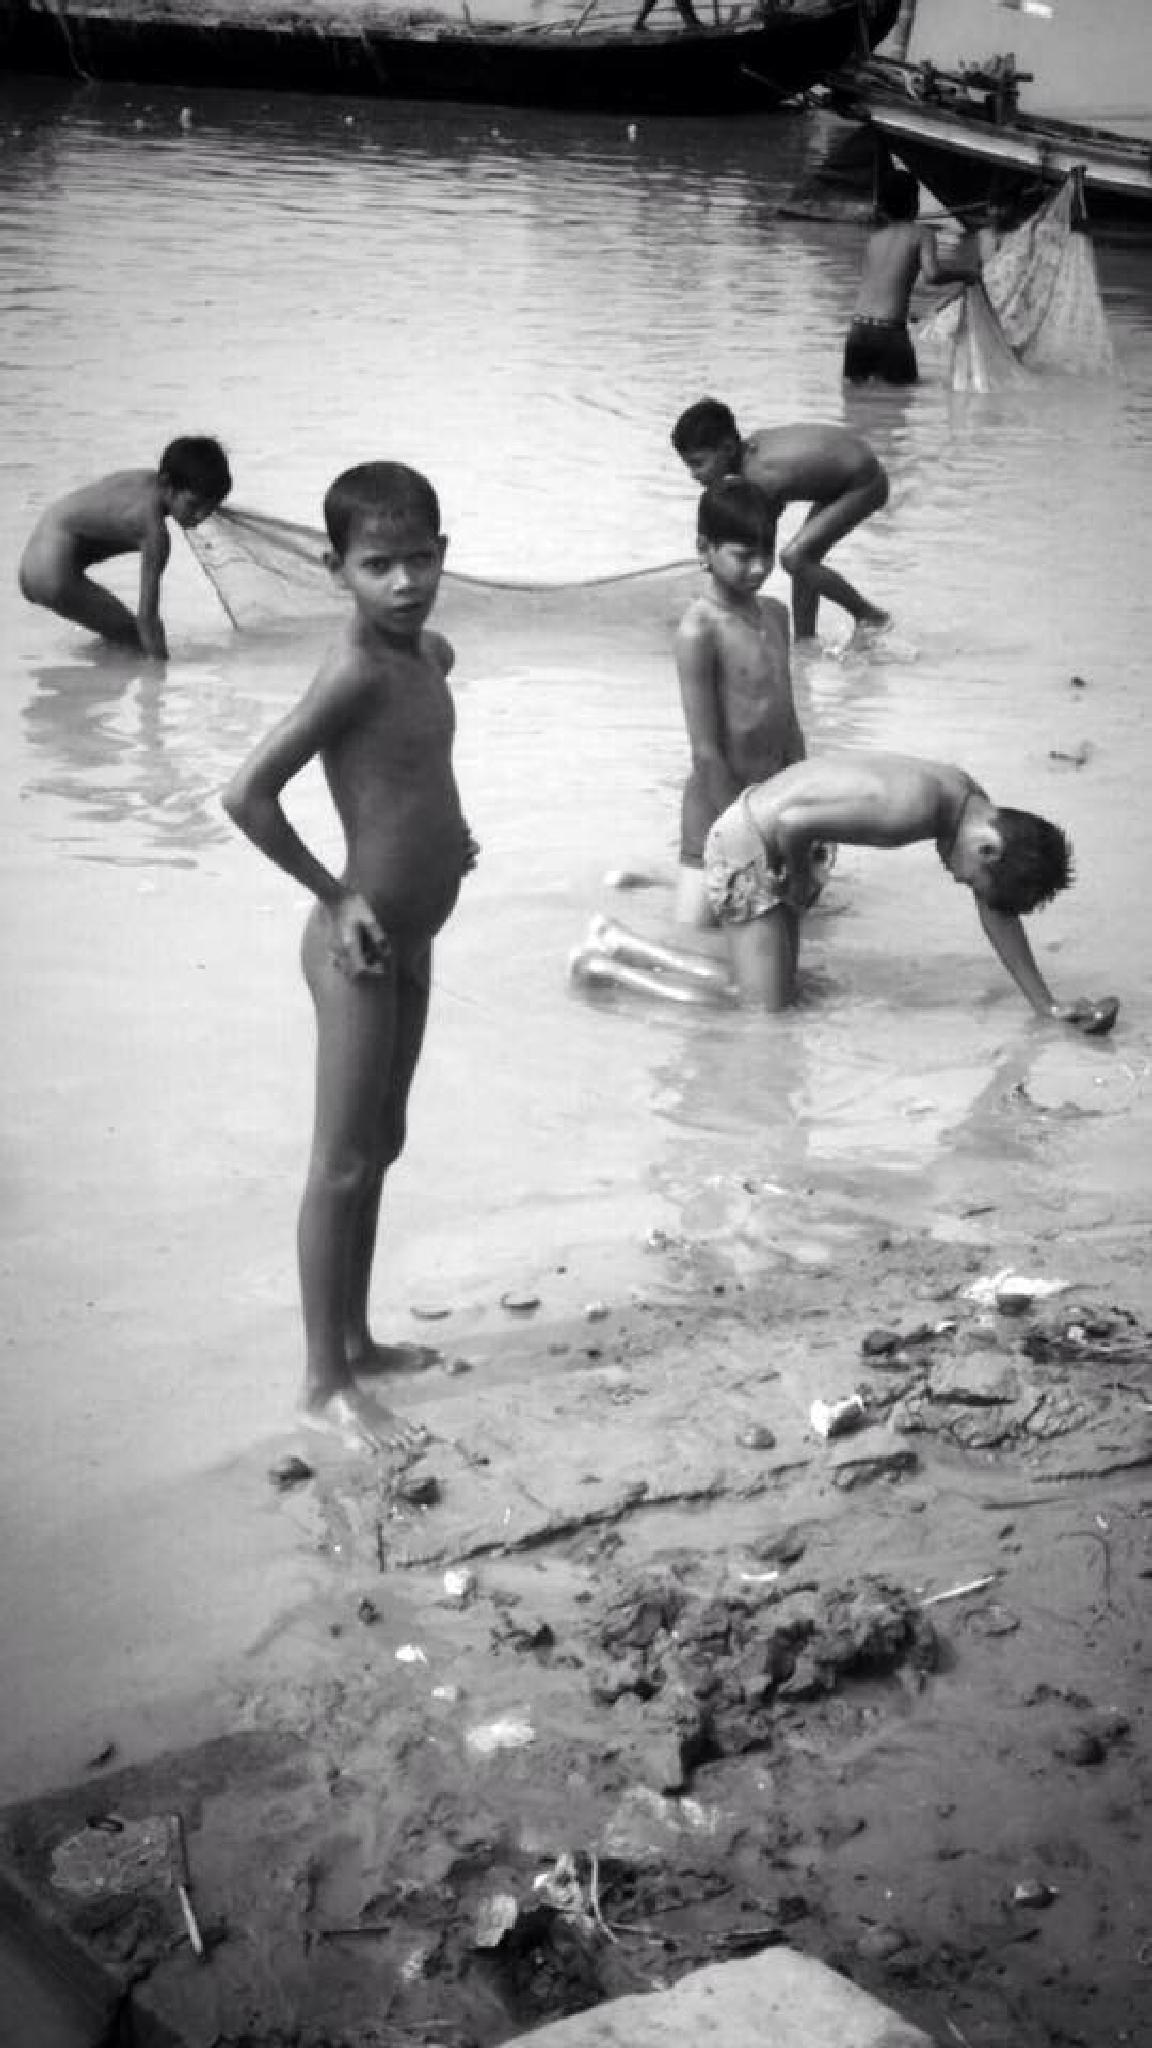 Untitled by Umakant Gupta